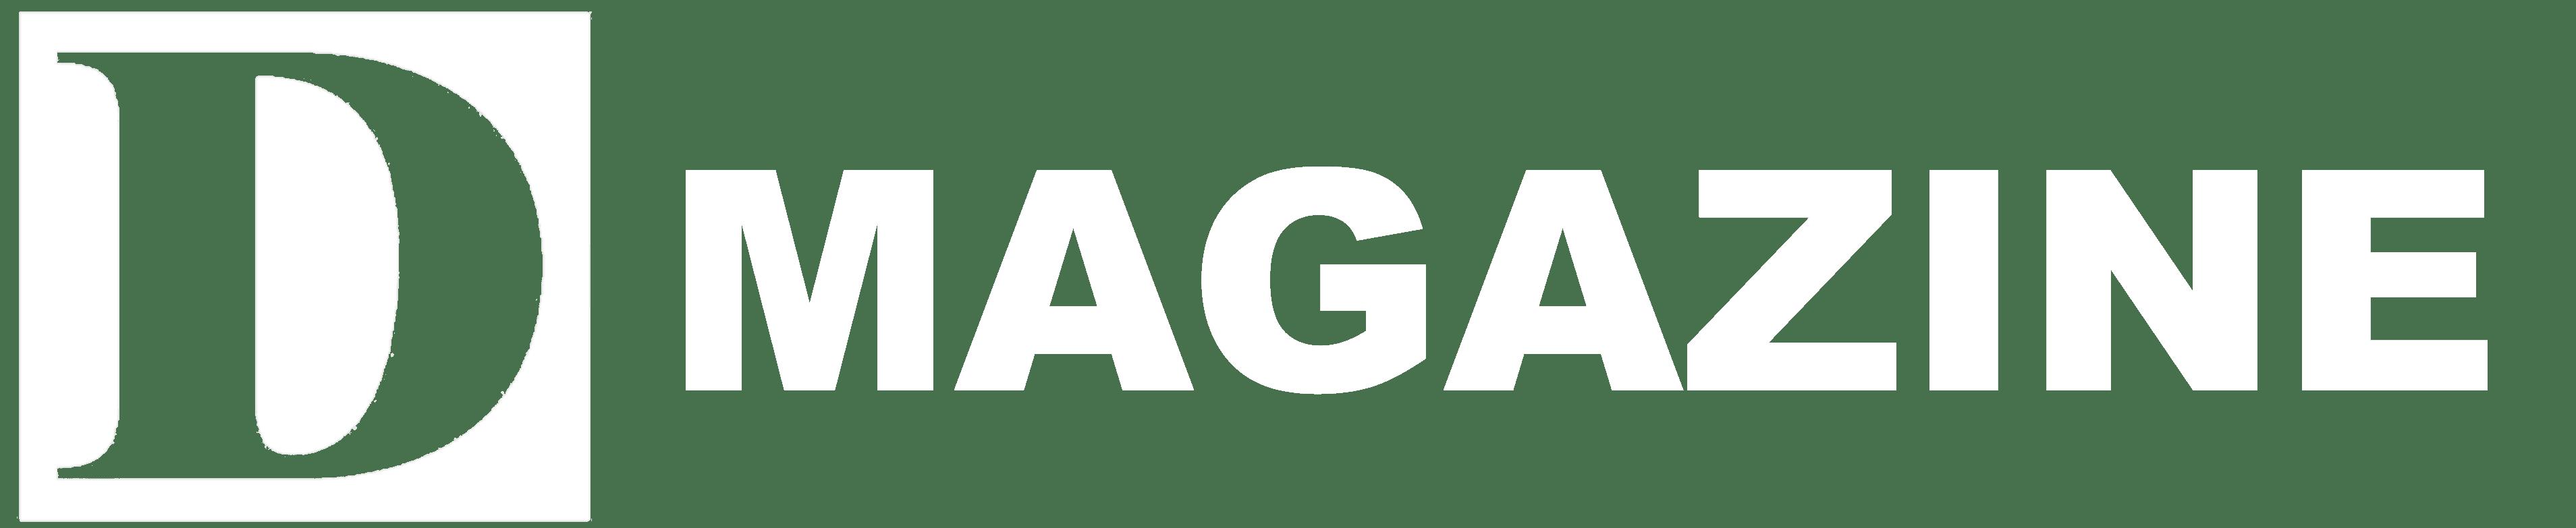 White D Magazine PNG Logo